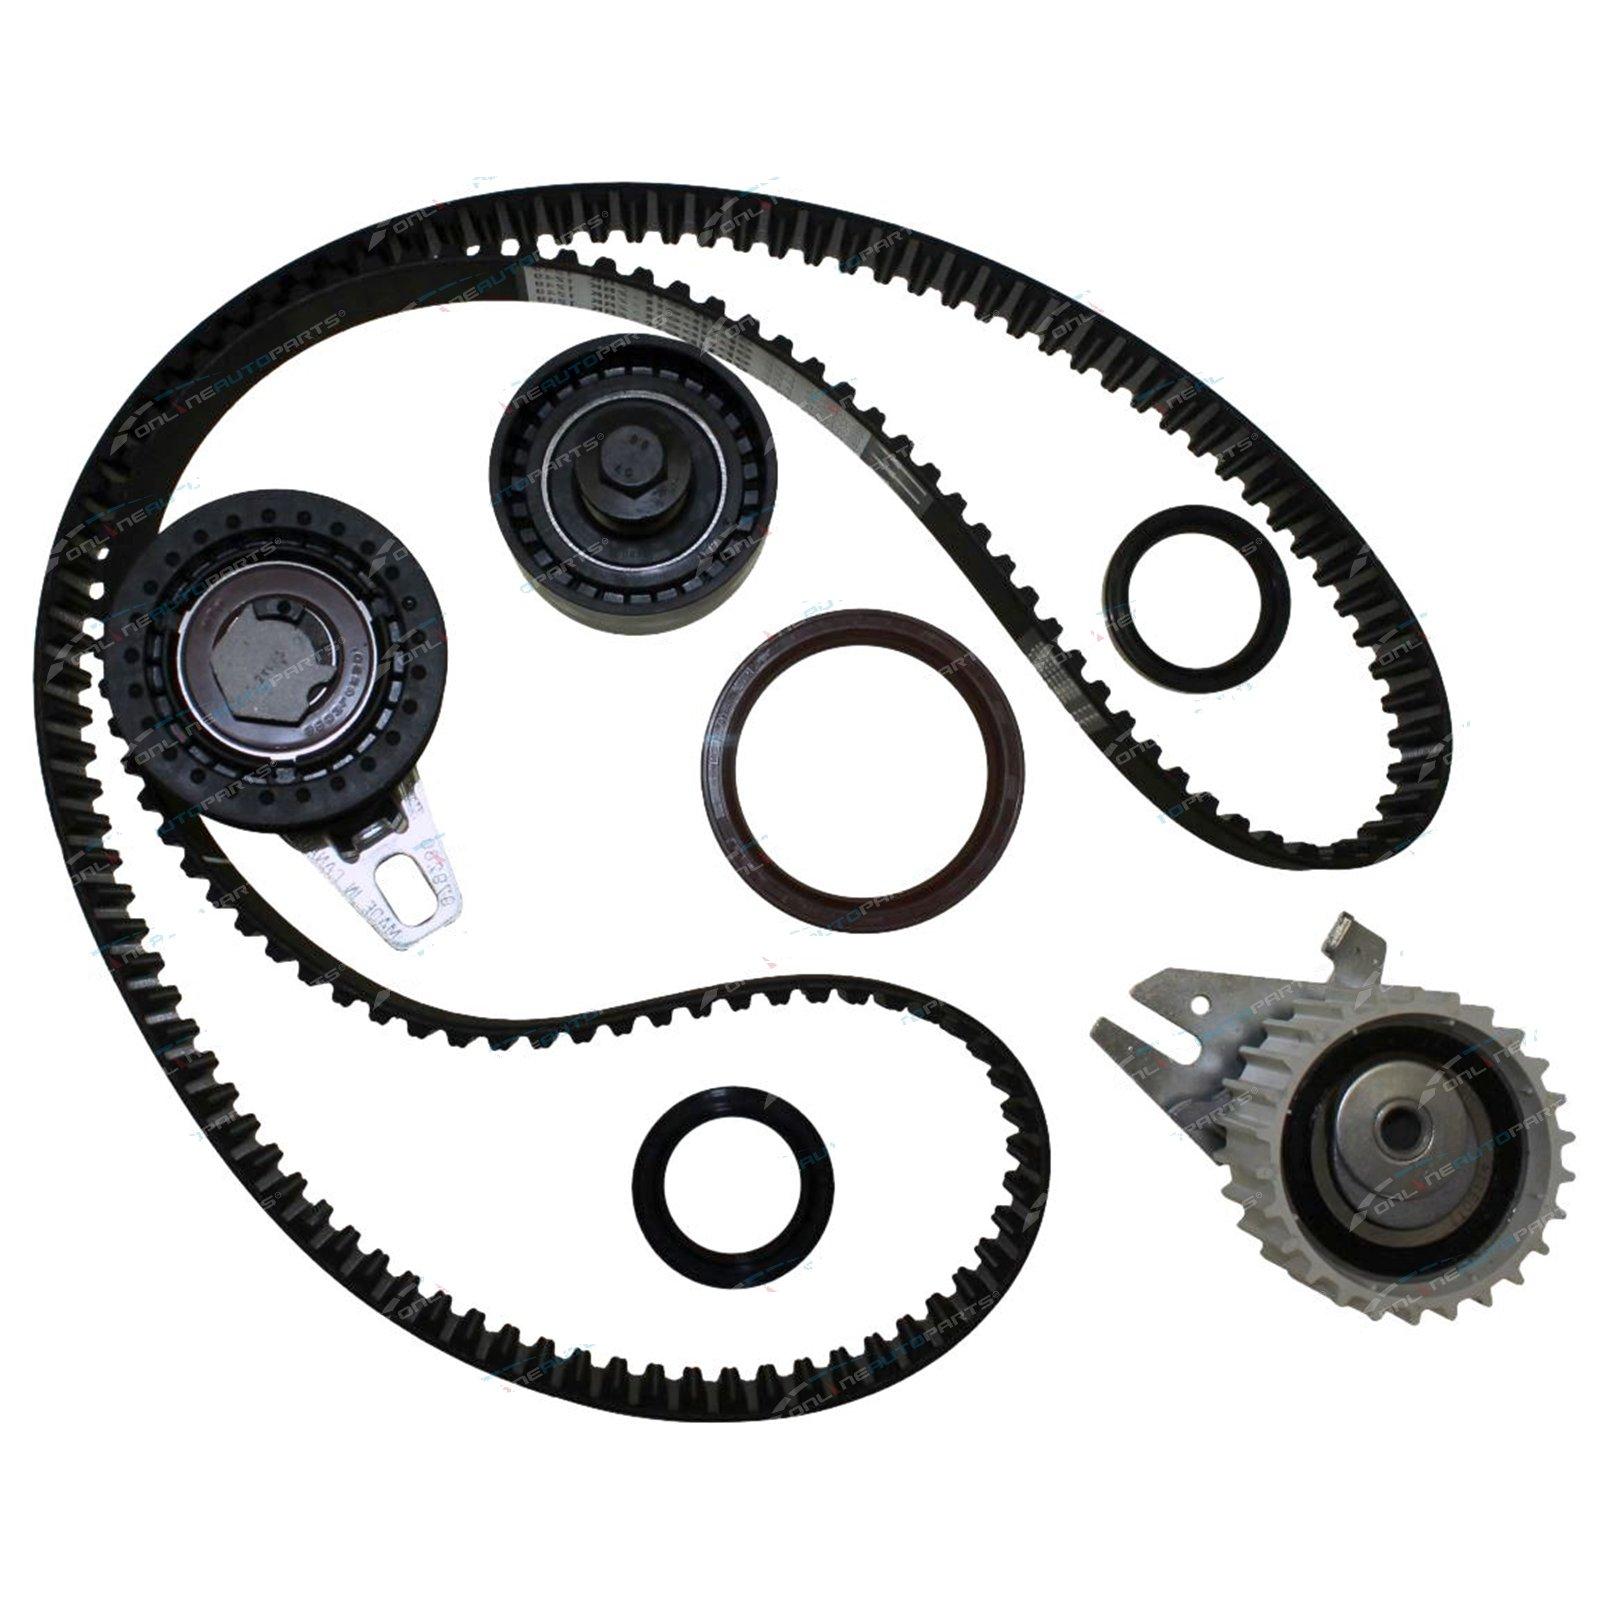 Timing Belt Tensioner Kit 147 156 1999-2010 2.0L AR32310 1970cc Twin Spark EFI 16v DOHC Alfa Romeo